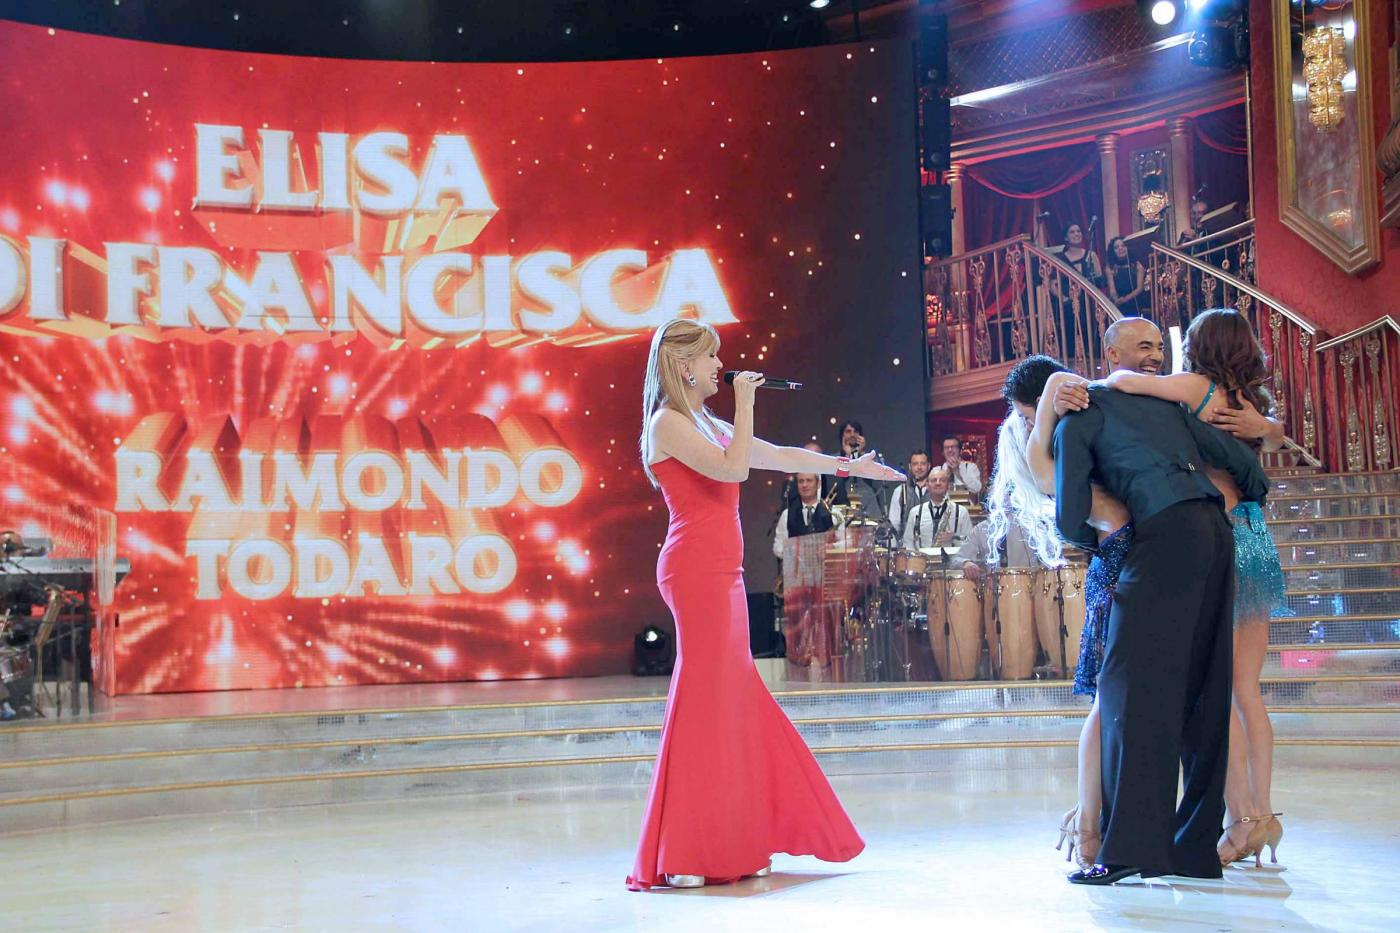 Ballando Con le stelle 2013 vince Elisa De Francisca05